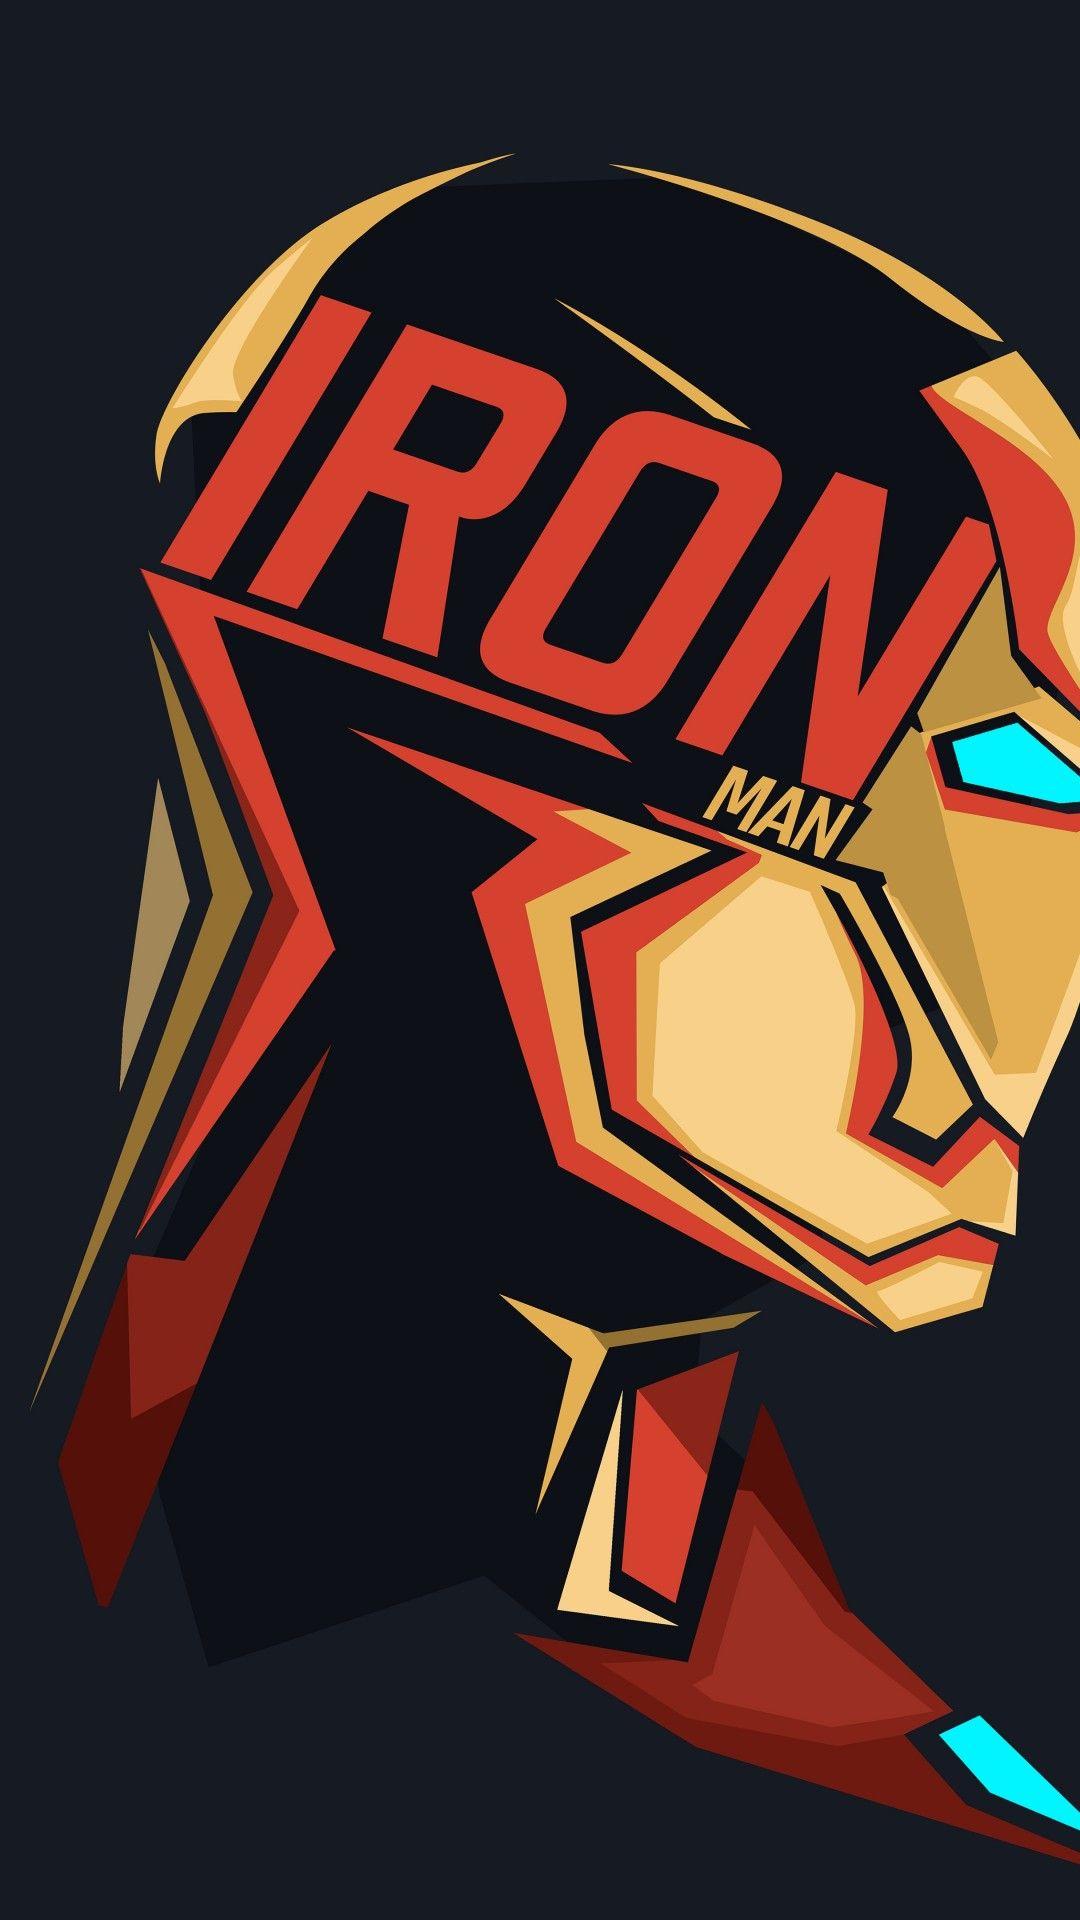 Iron Man Profile View Minimal Design Marvel Iron Man Marvel Heroes Iron Man